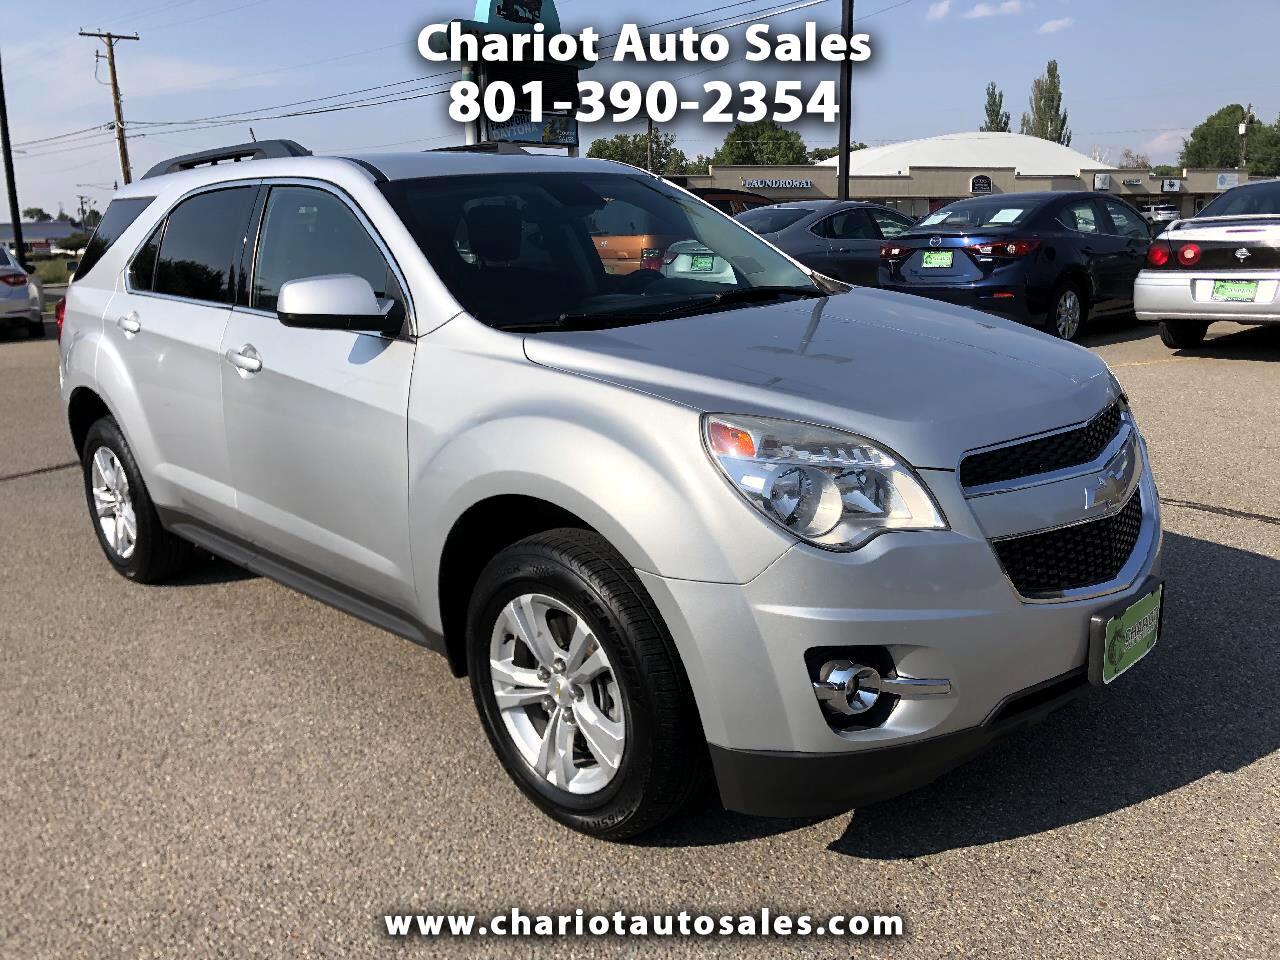 Chevrolet Equinox 2LT AWD 2013